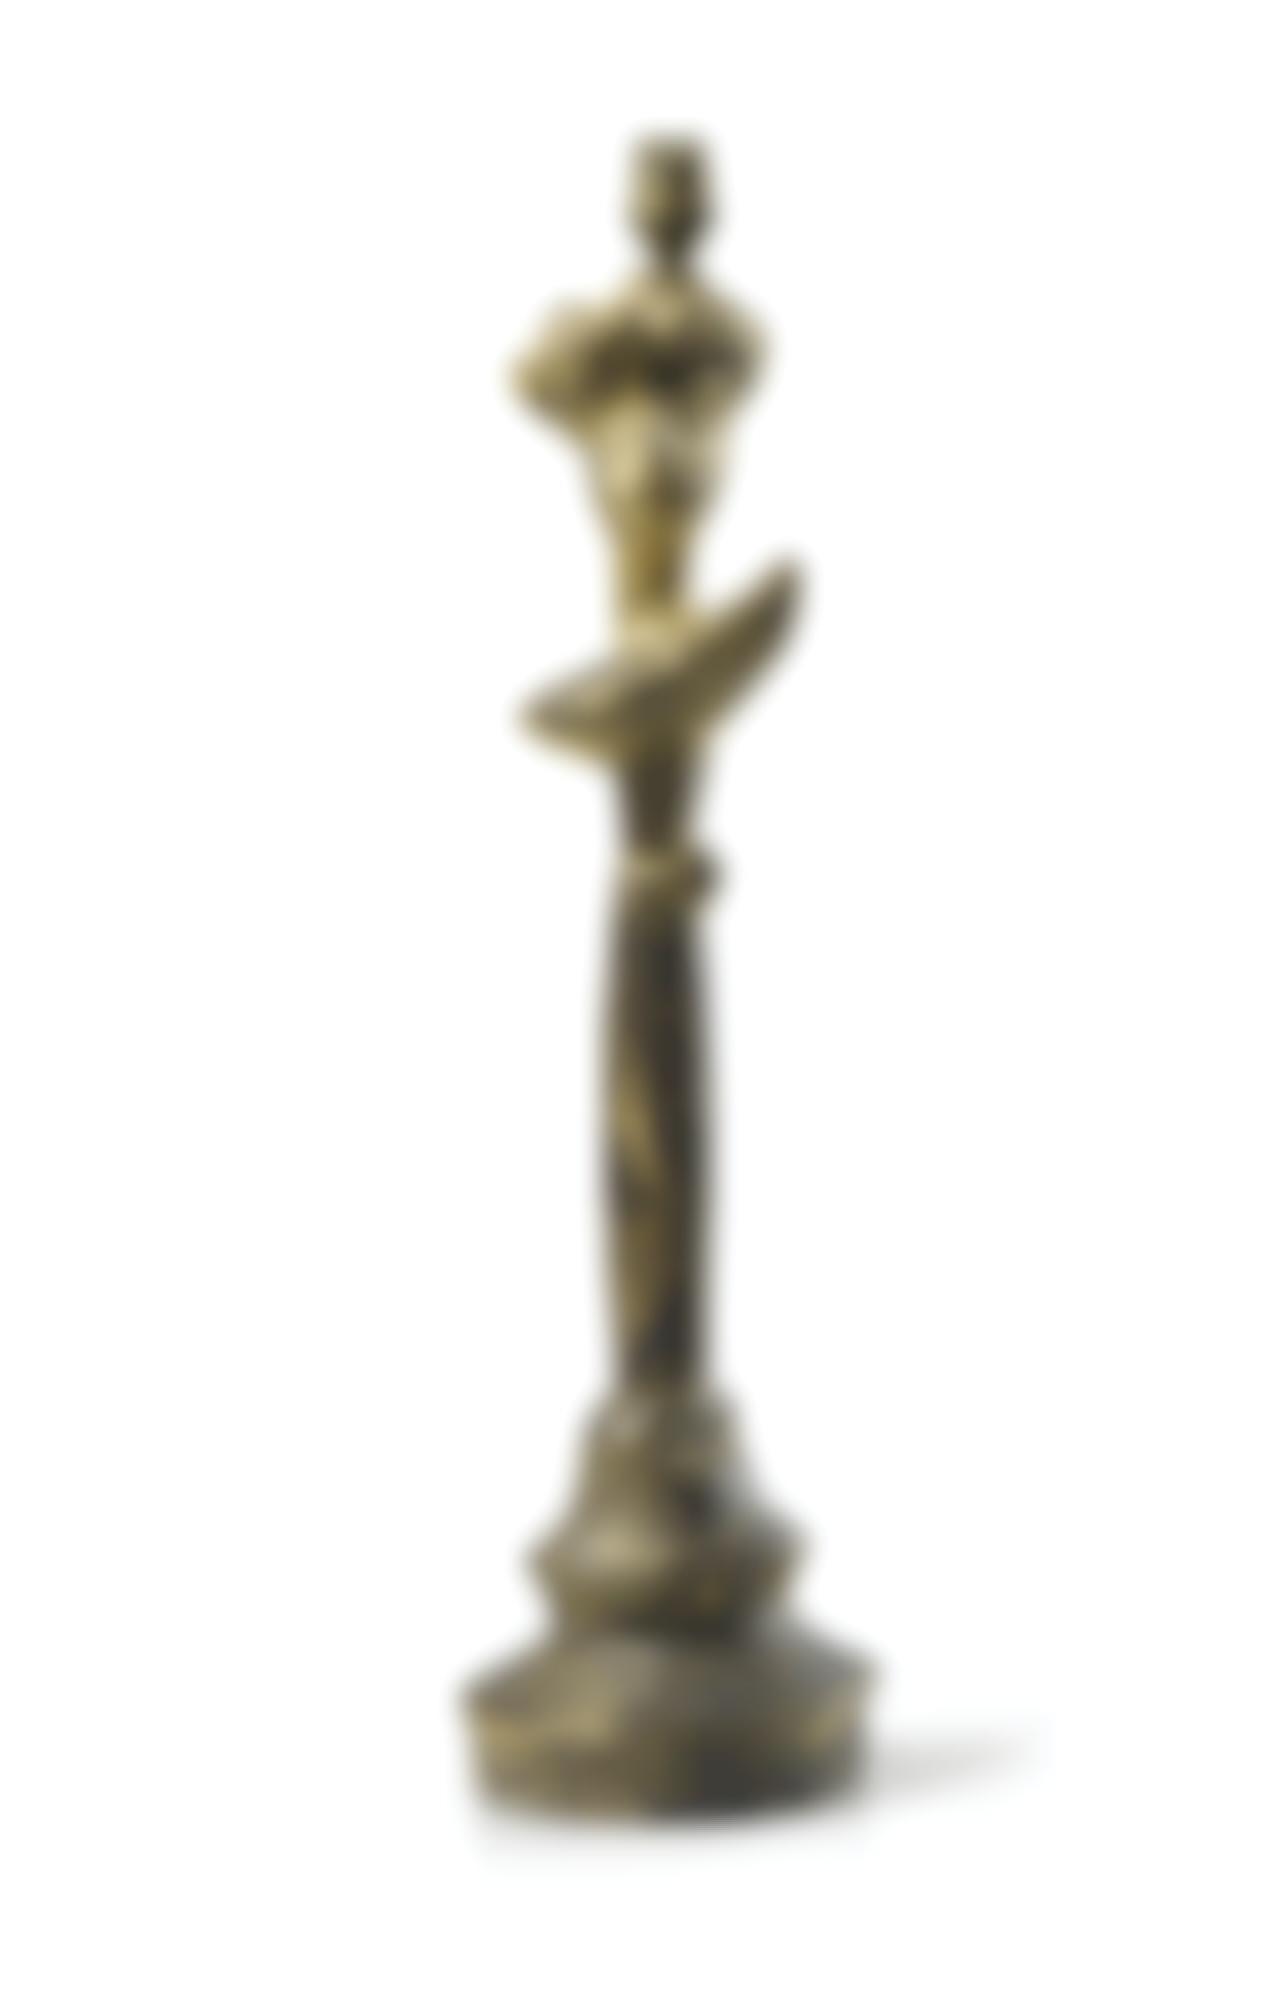 Syrie Maugham - Lampe Ecossais, D'Apres Le Modele D'Alberto Giacometti-1940